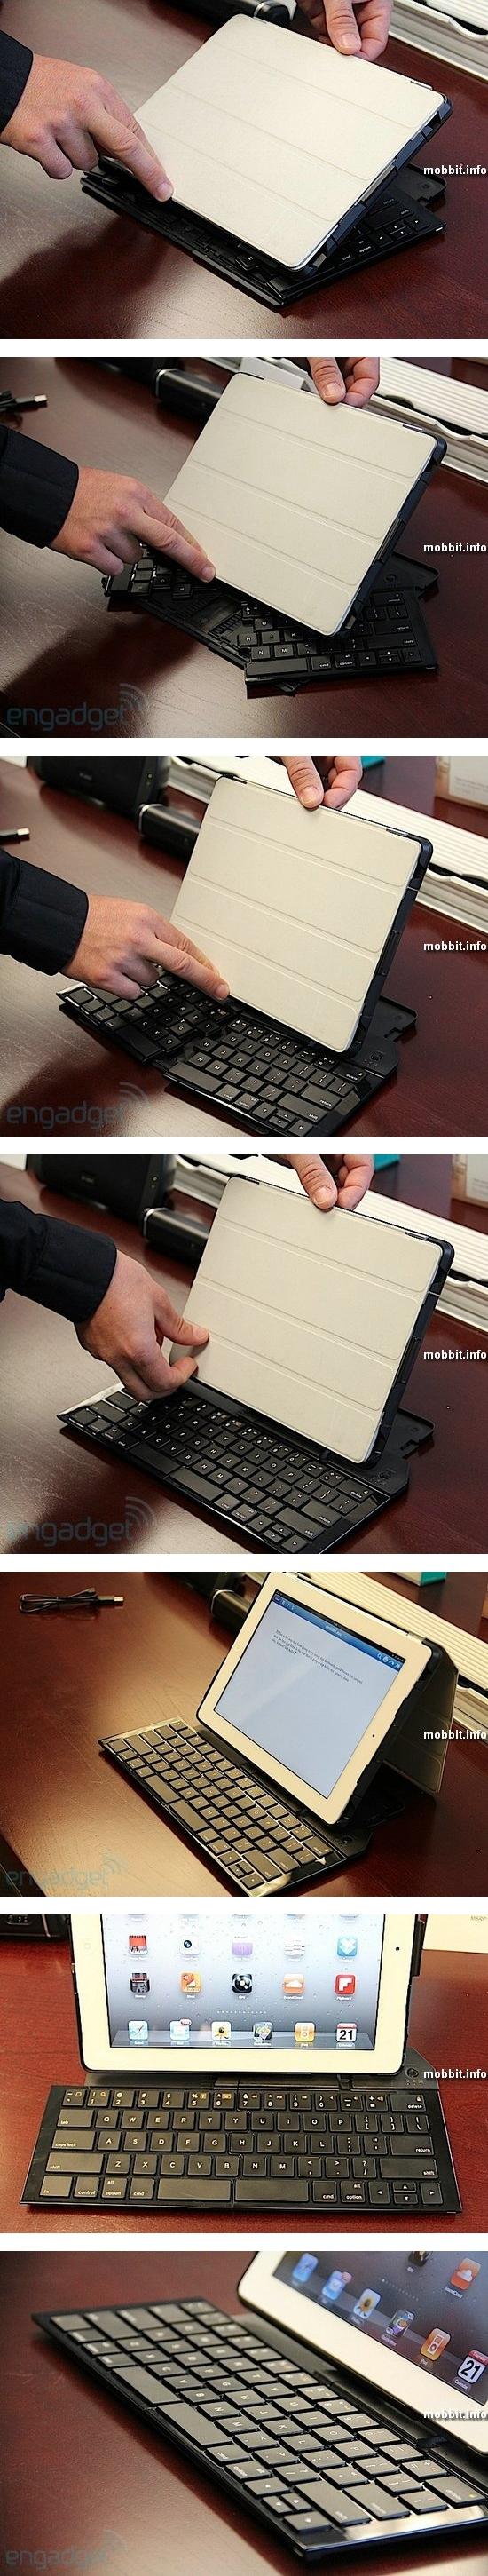 Складная клавиатура Logitech для iPad